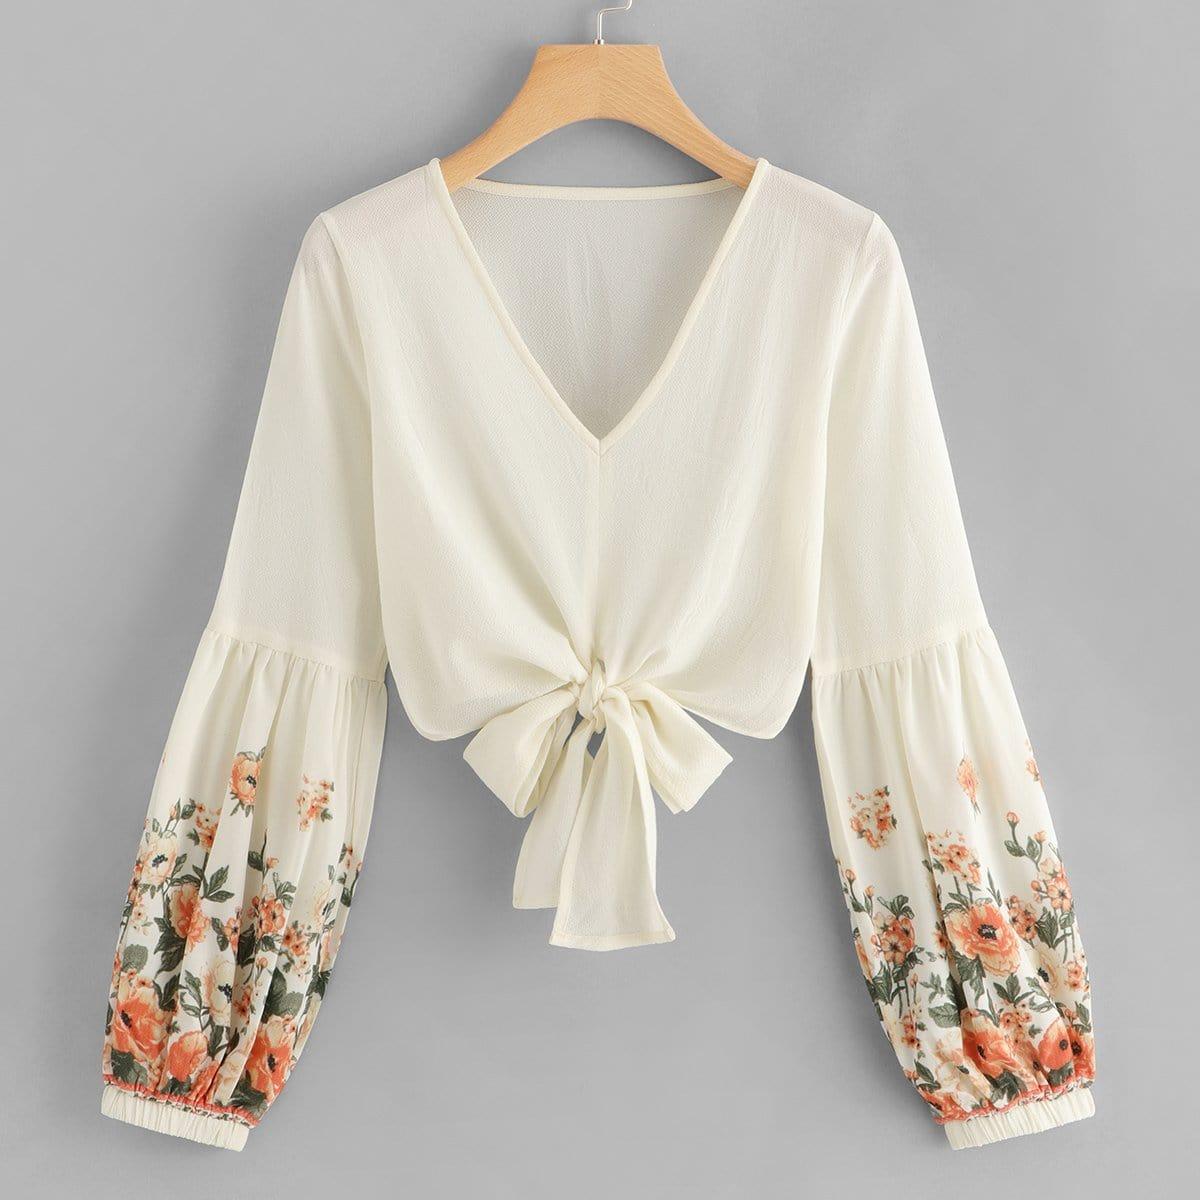 SHEIN coupon: Floral Chiffon Self-Tie Crop Top